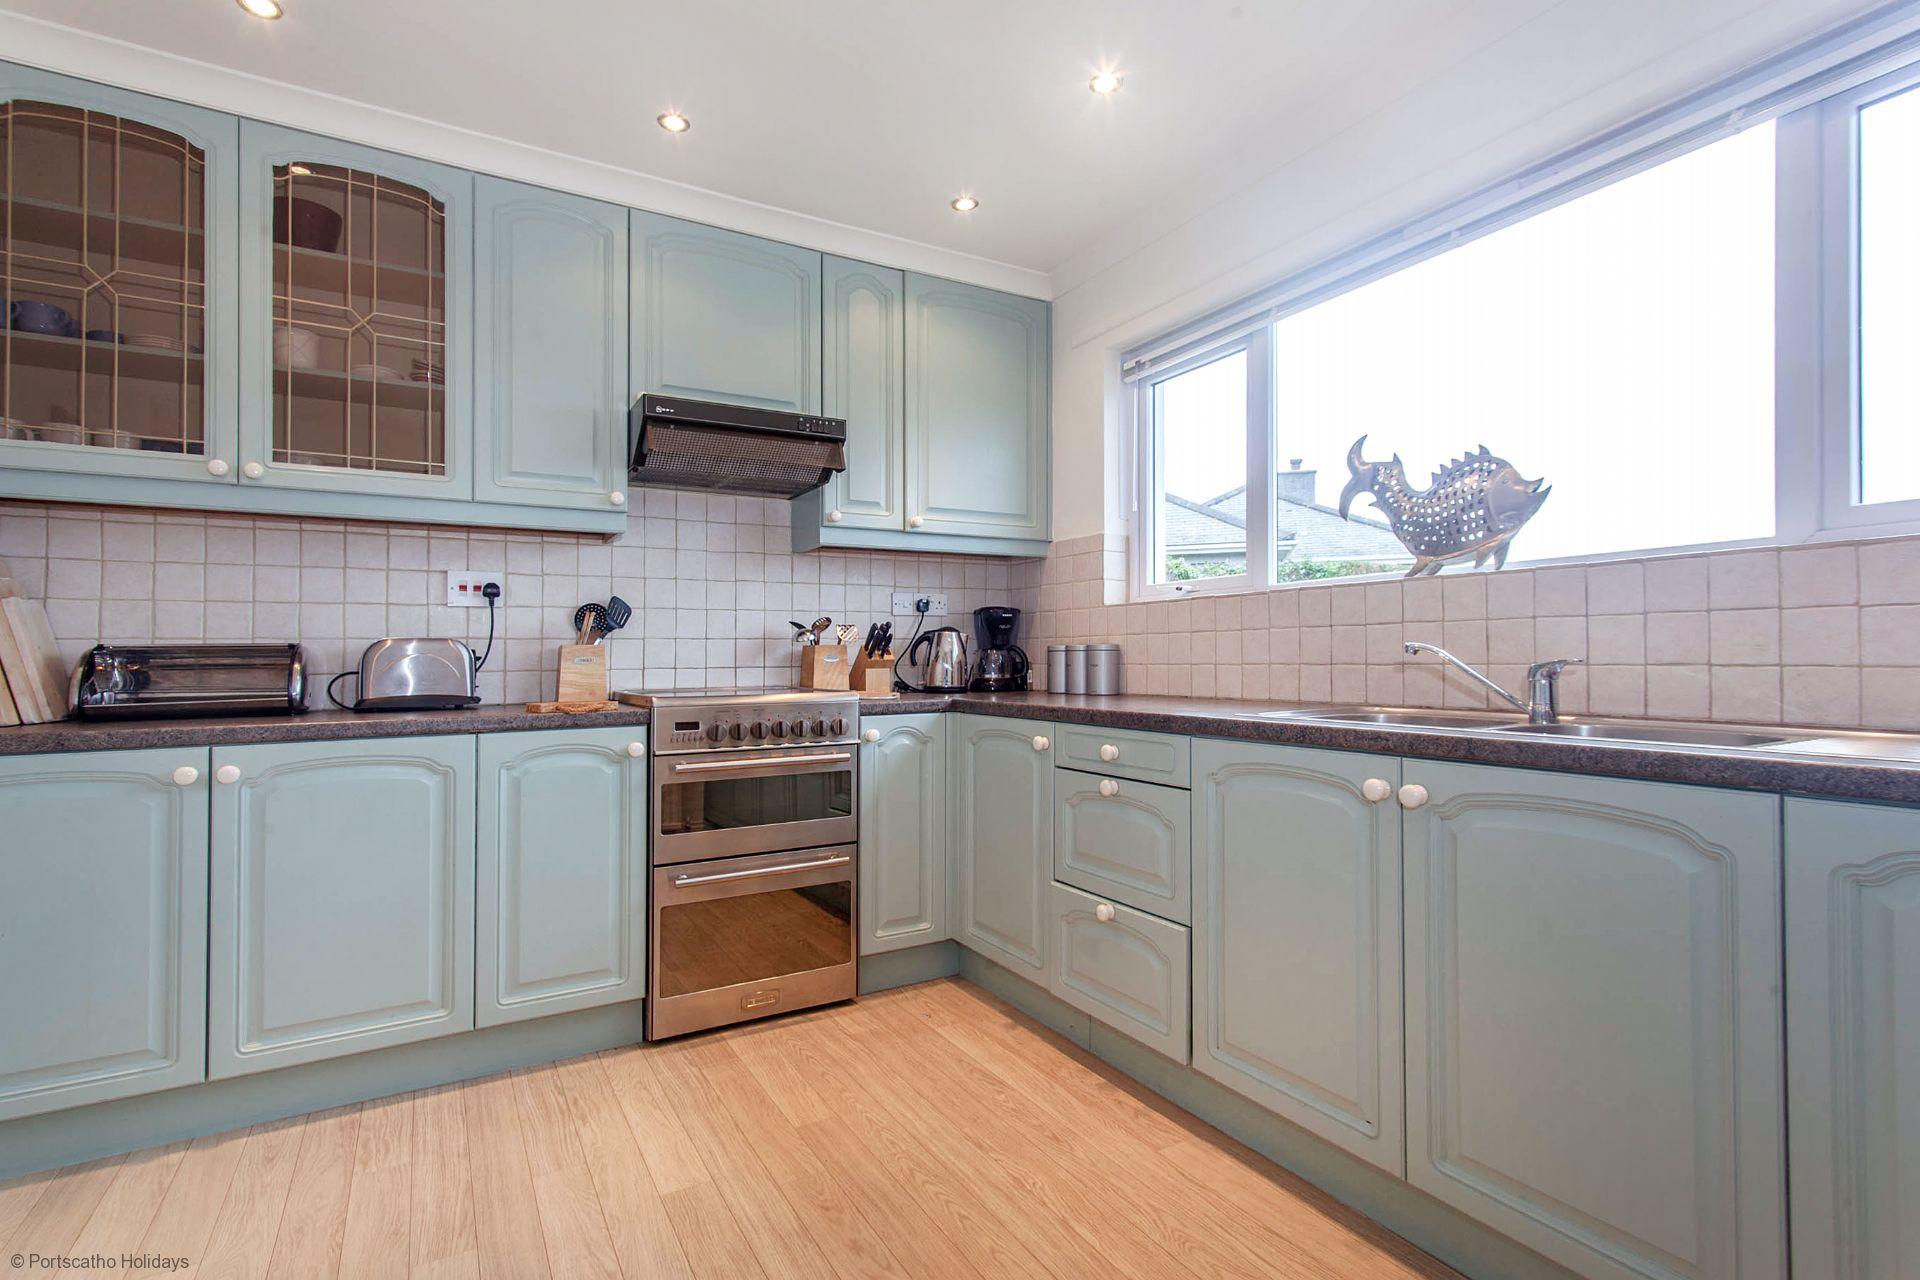 Poldhu; St Mawes; Kitchen